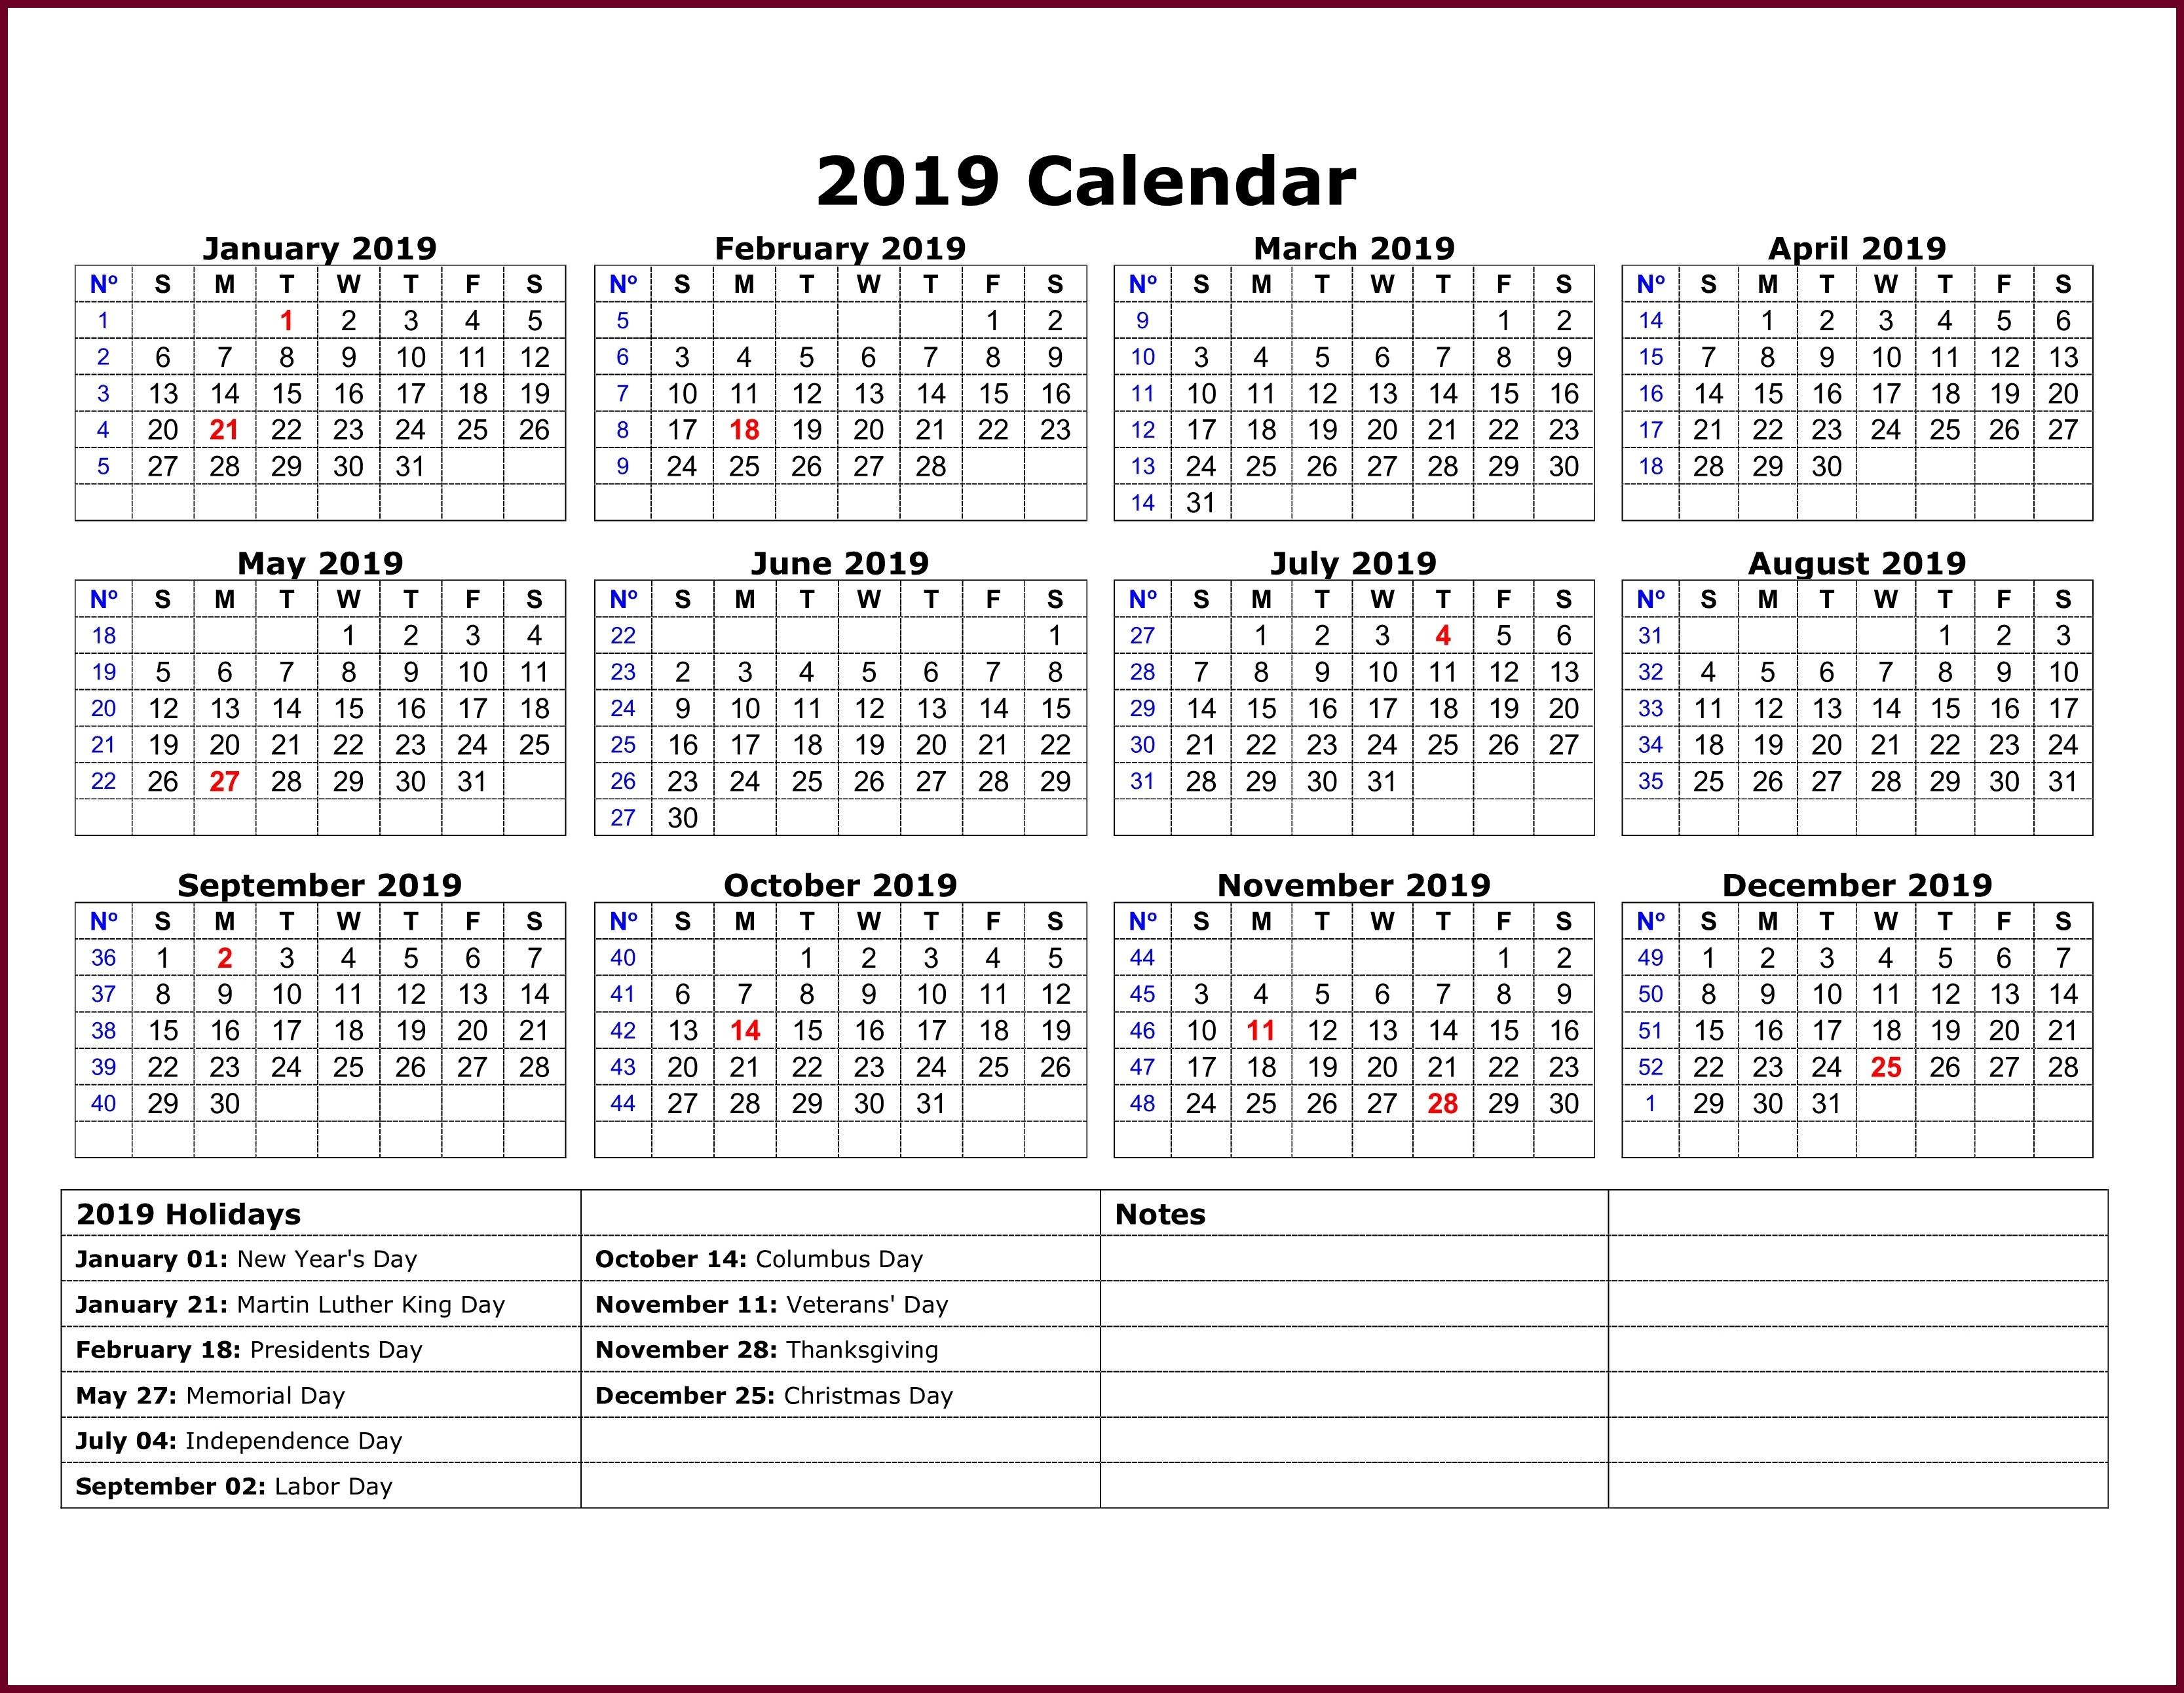 Calendar 2019 Template Excel